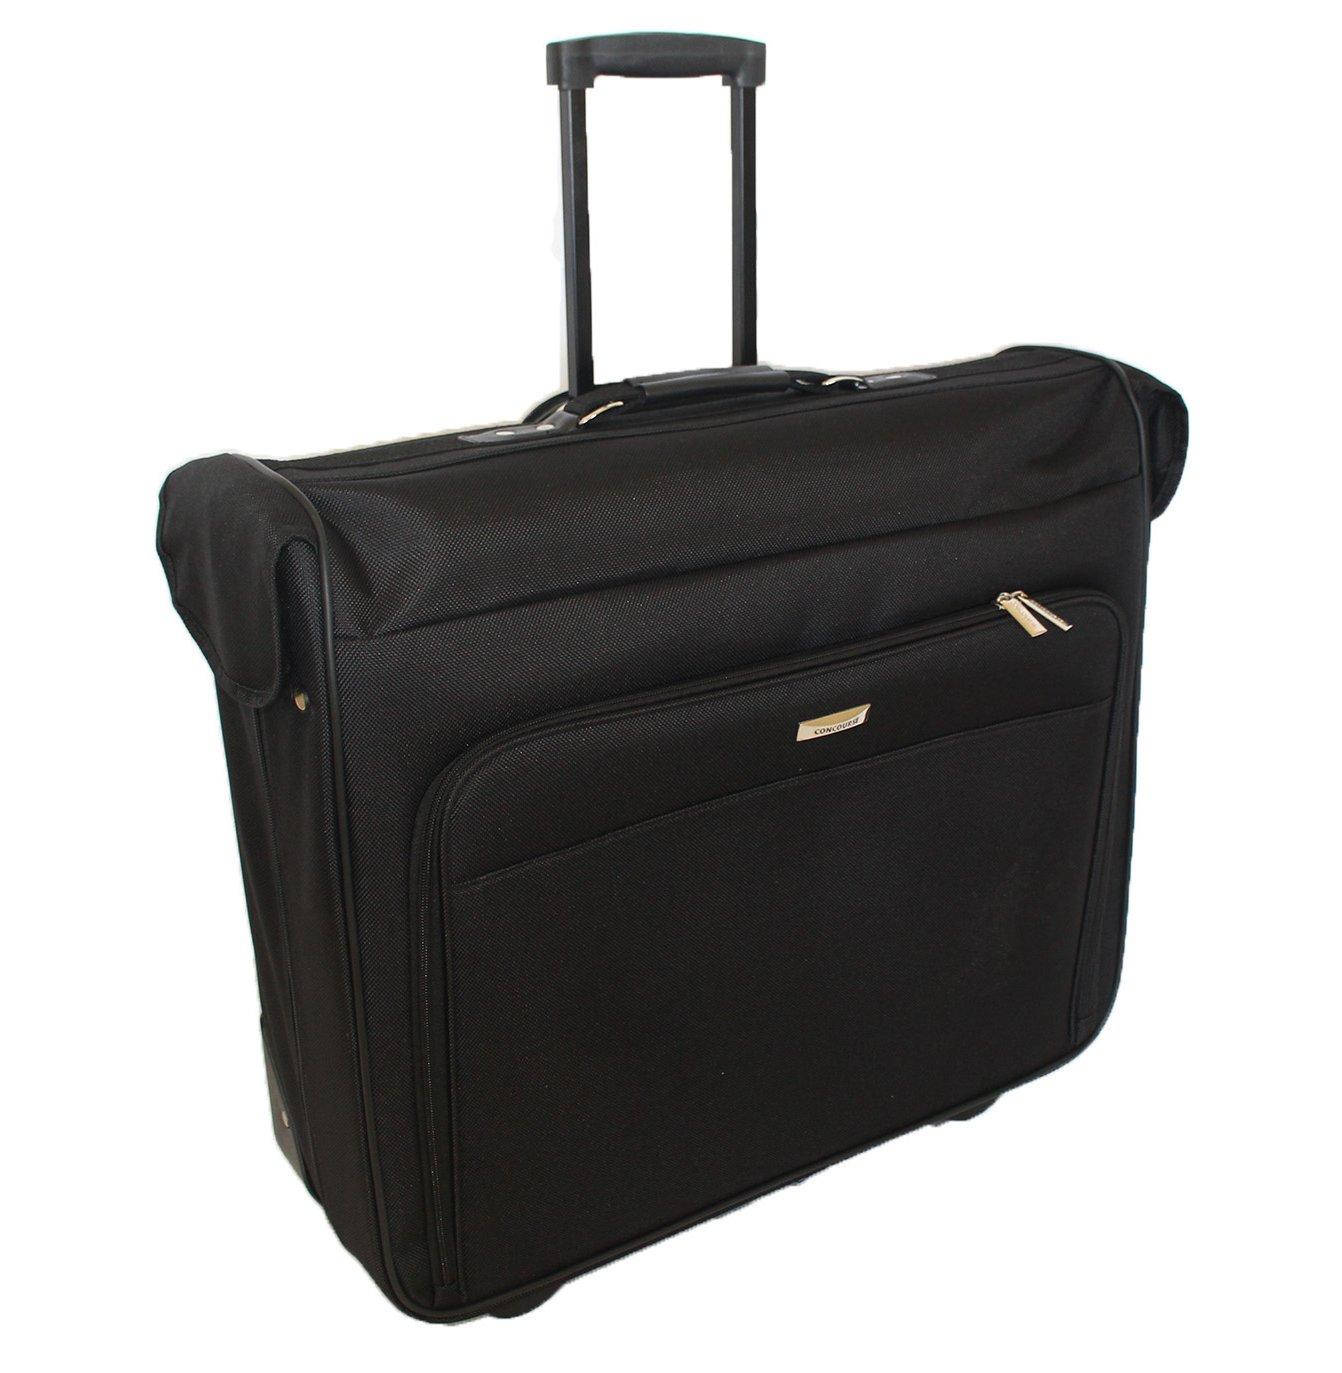 44-In. Wheeled Garment Bag in Black